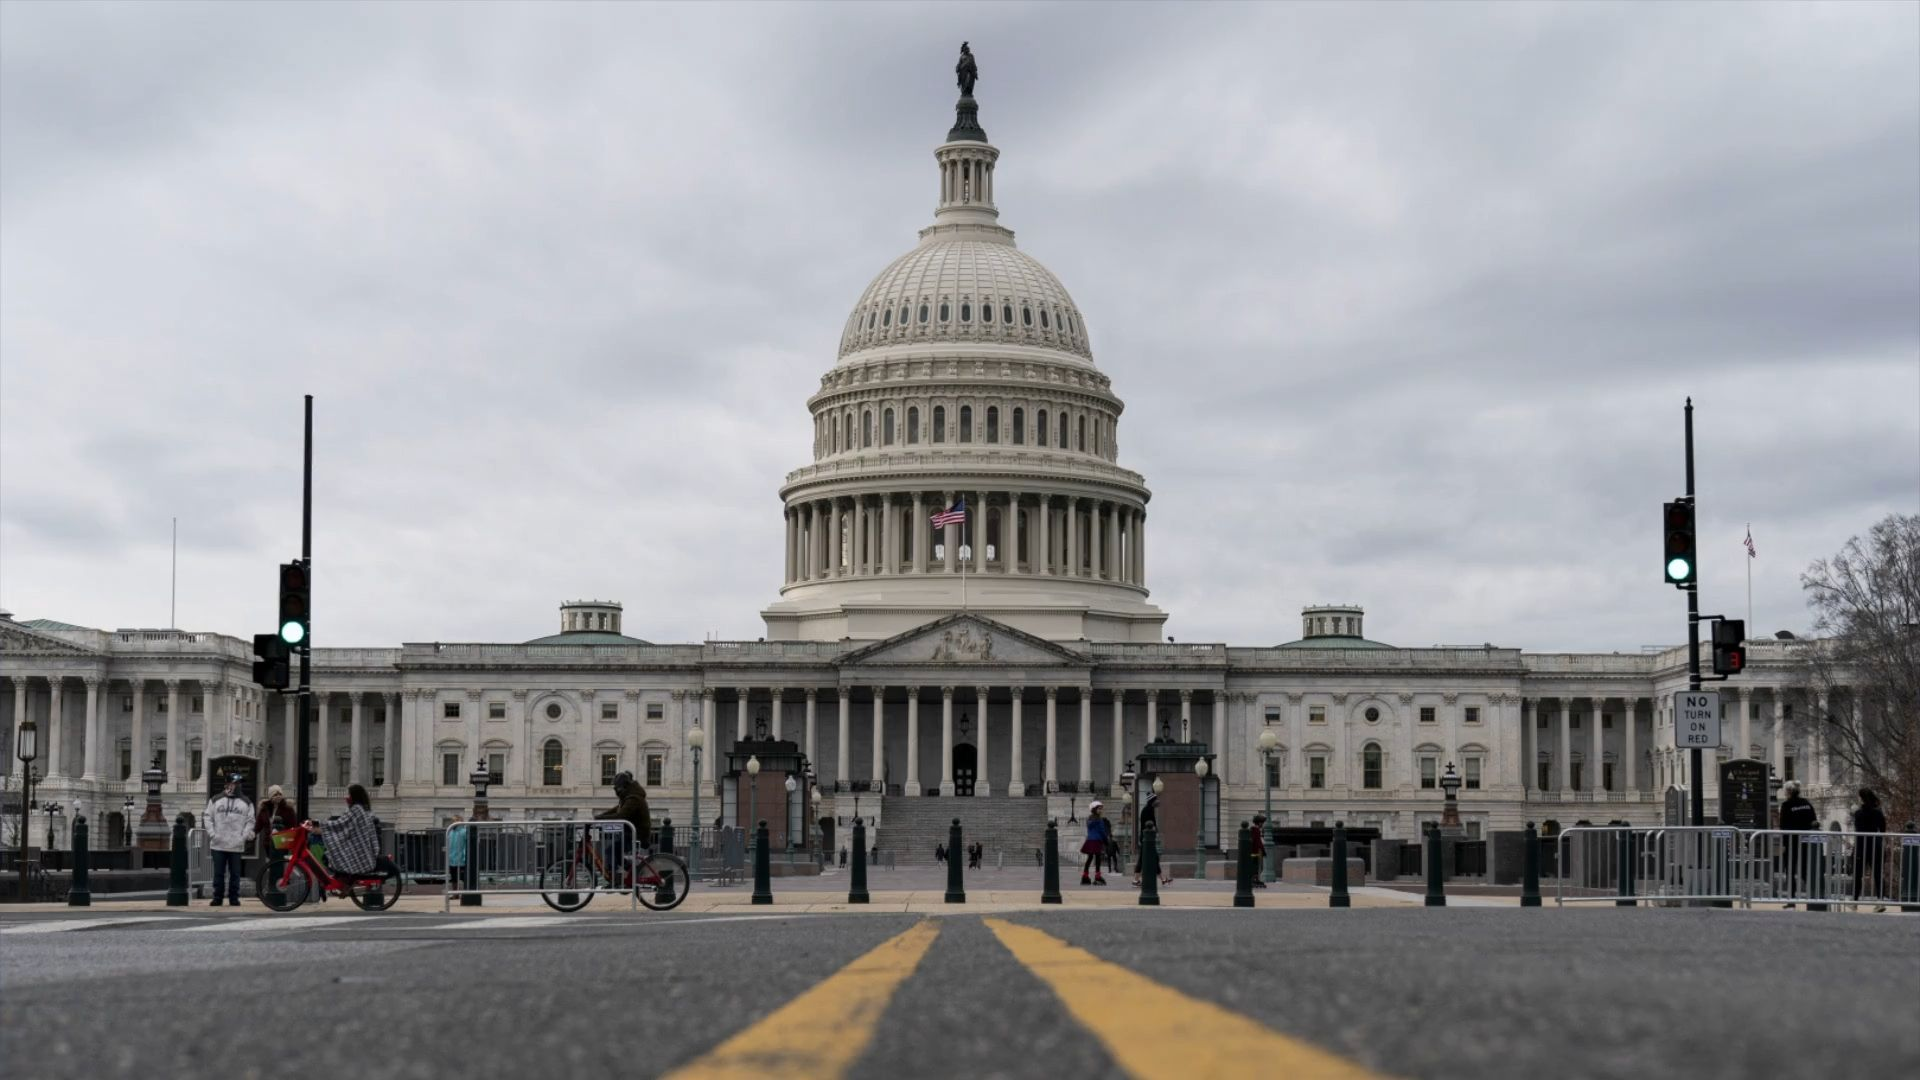 Gewaltsame Proteste in Washington: Trump-Anhänger stürmen Kapitol